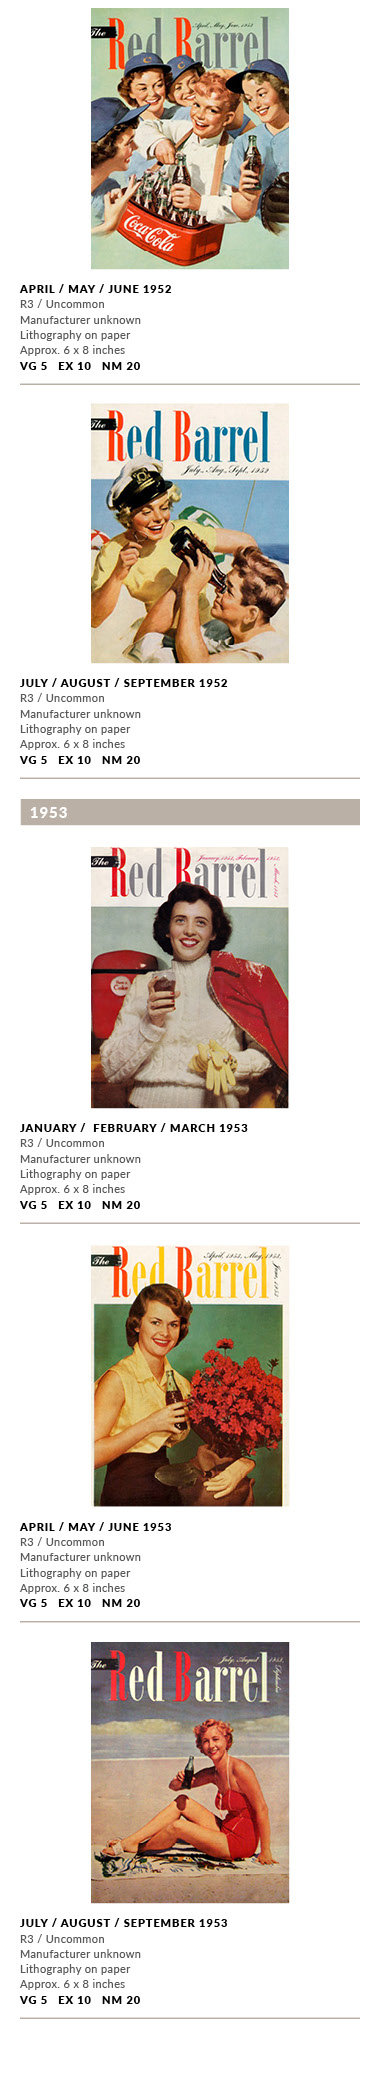 RedBarrels1946-1955_PHONE_12.jpg